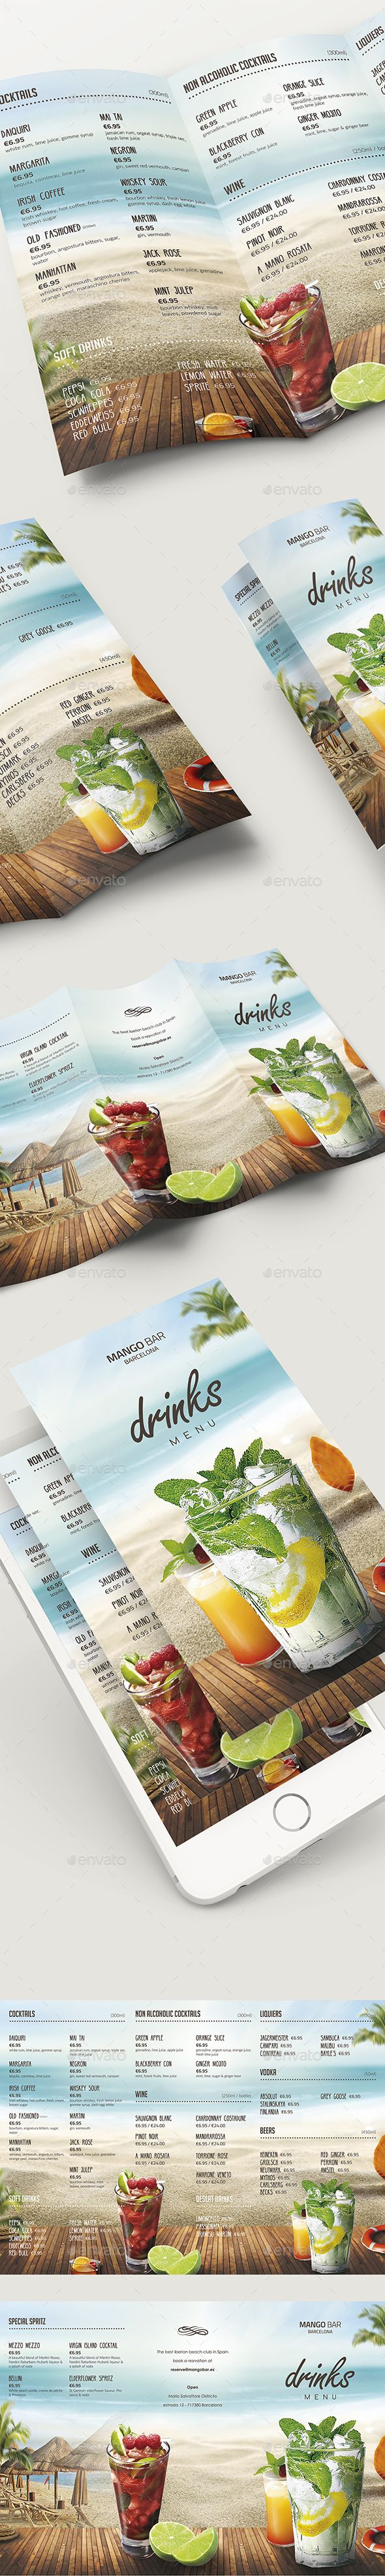 Drinks Menu Tri Fold   PSD Template • Download ➝ https://graphicriver.net/item/drinks-menu-tri-fold-template/17137904?ref=pxcr